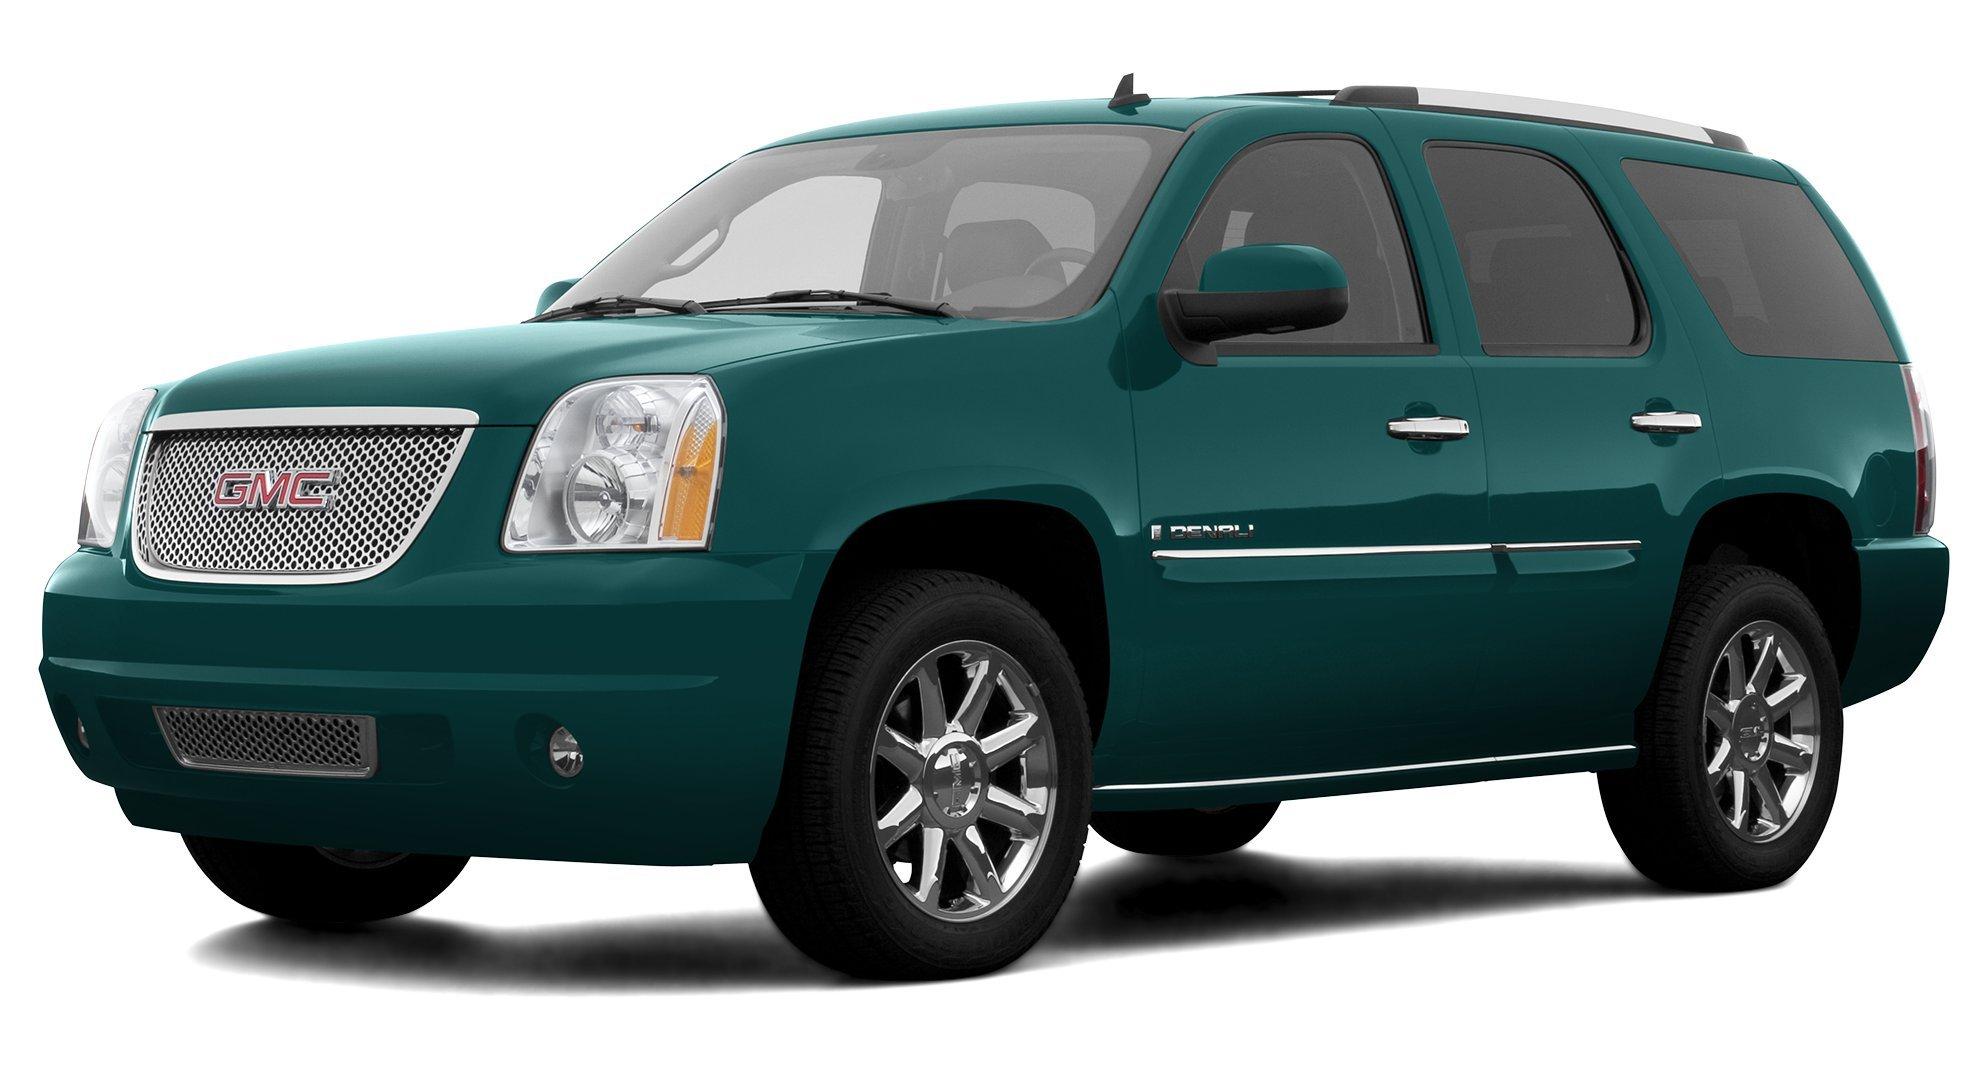 Amazon 2007 GMC Yukon Reviews and Specs Vehicles